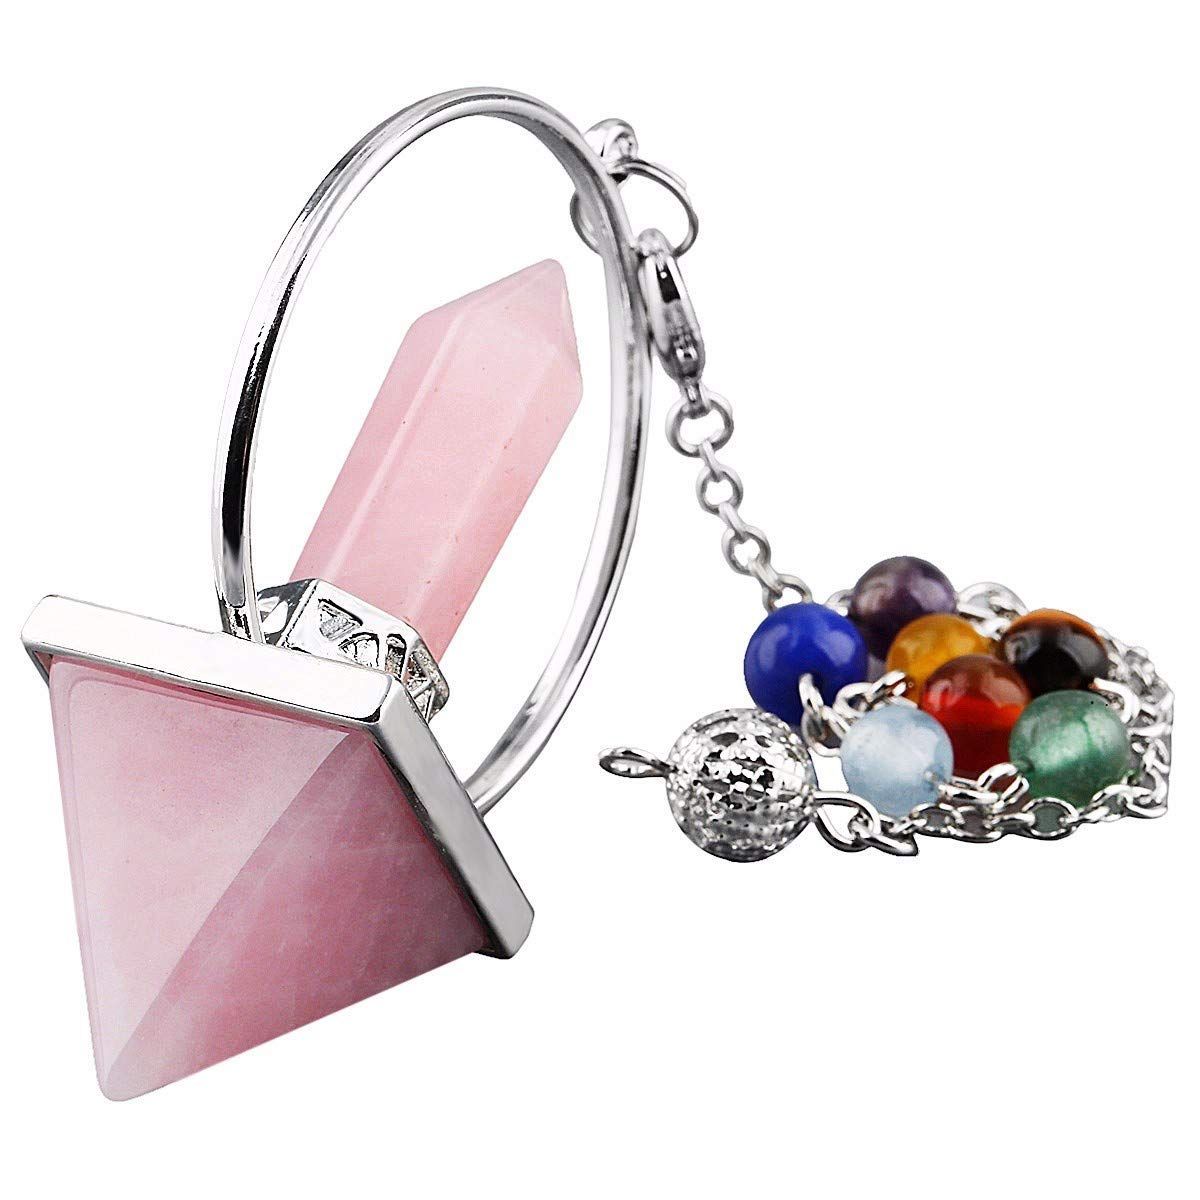 TUMBEELLUWA Healing Crystal Quartz 7 Chakra Pendulum Dowsing Gemstone Divination Reiki Stone,Rose Quartz